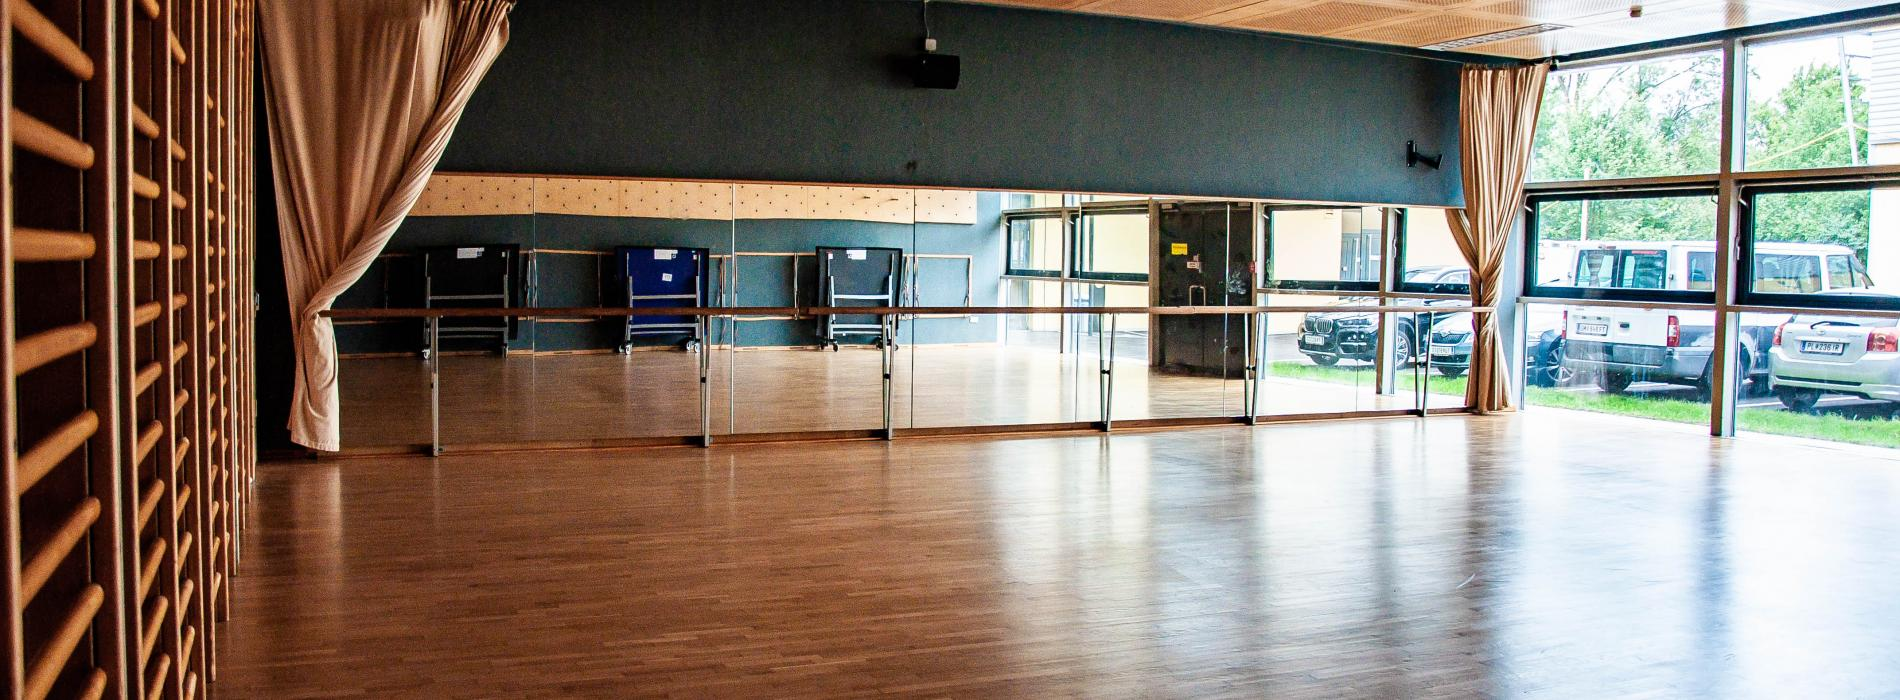 artistic gymnastics room